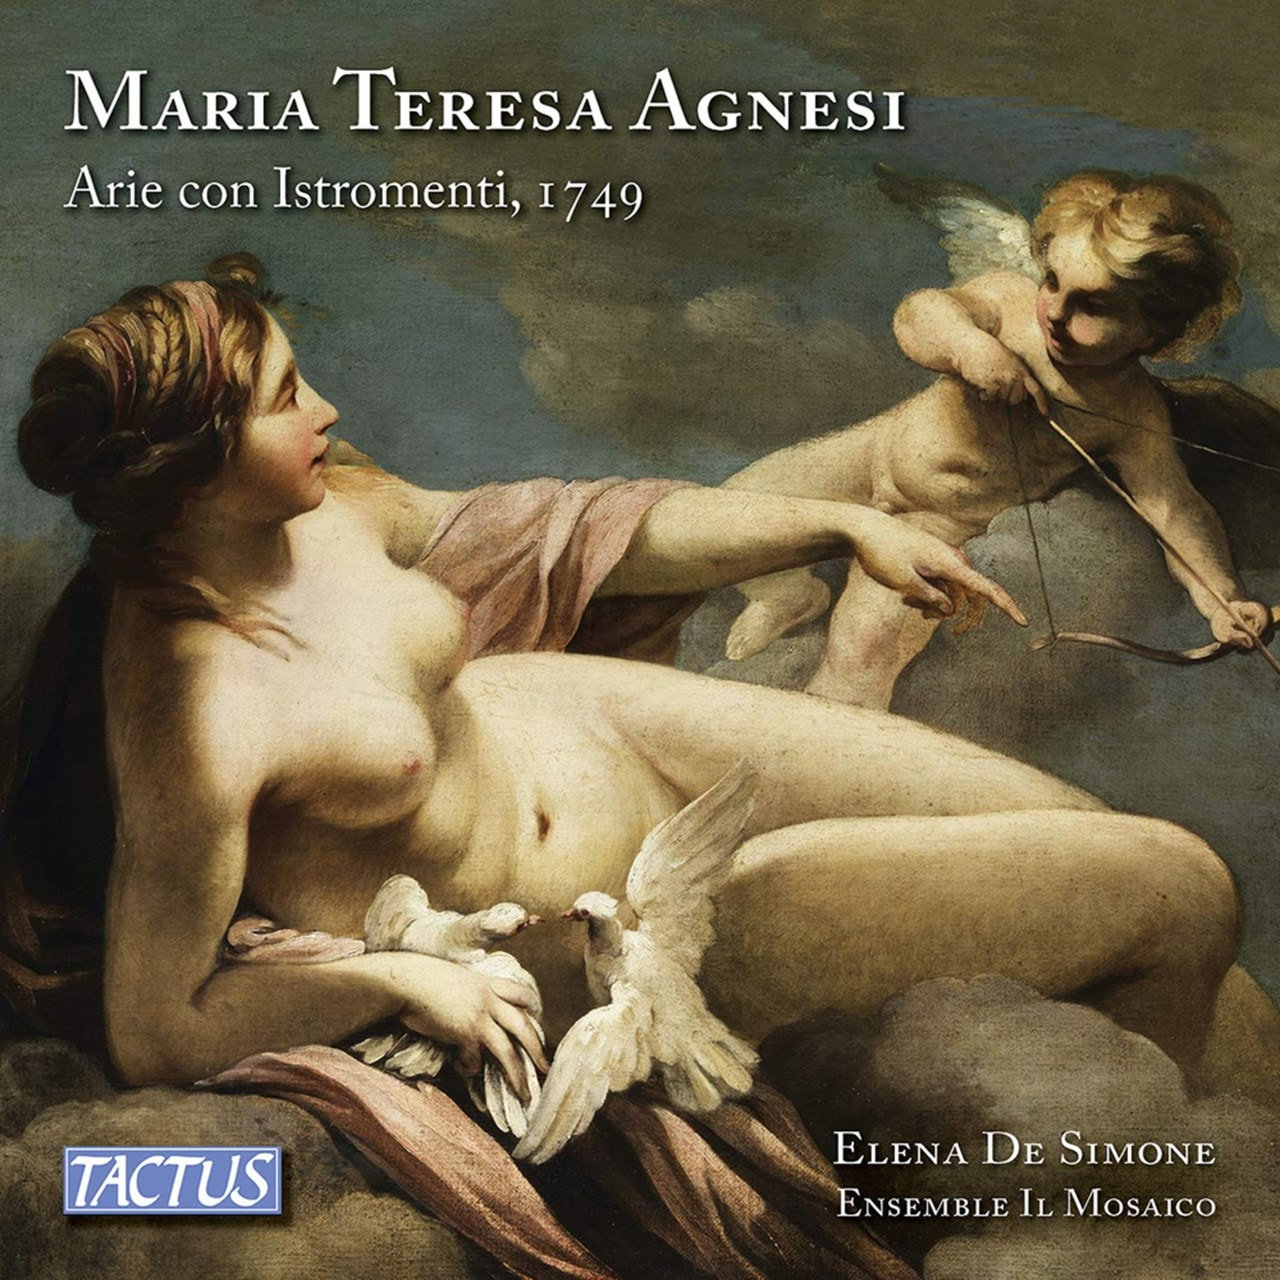 Maria Teresa Agnesi: Arie Con Istromenti, 1749 - 1